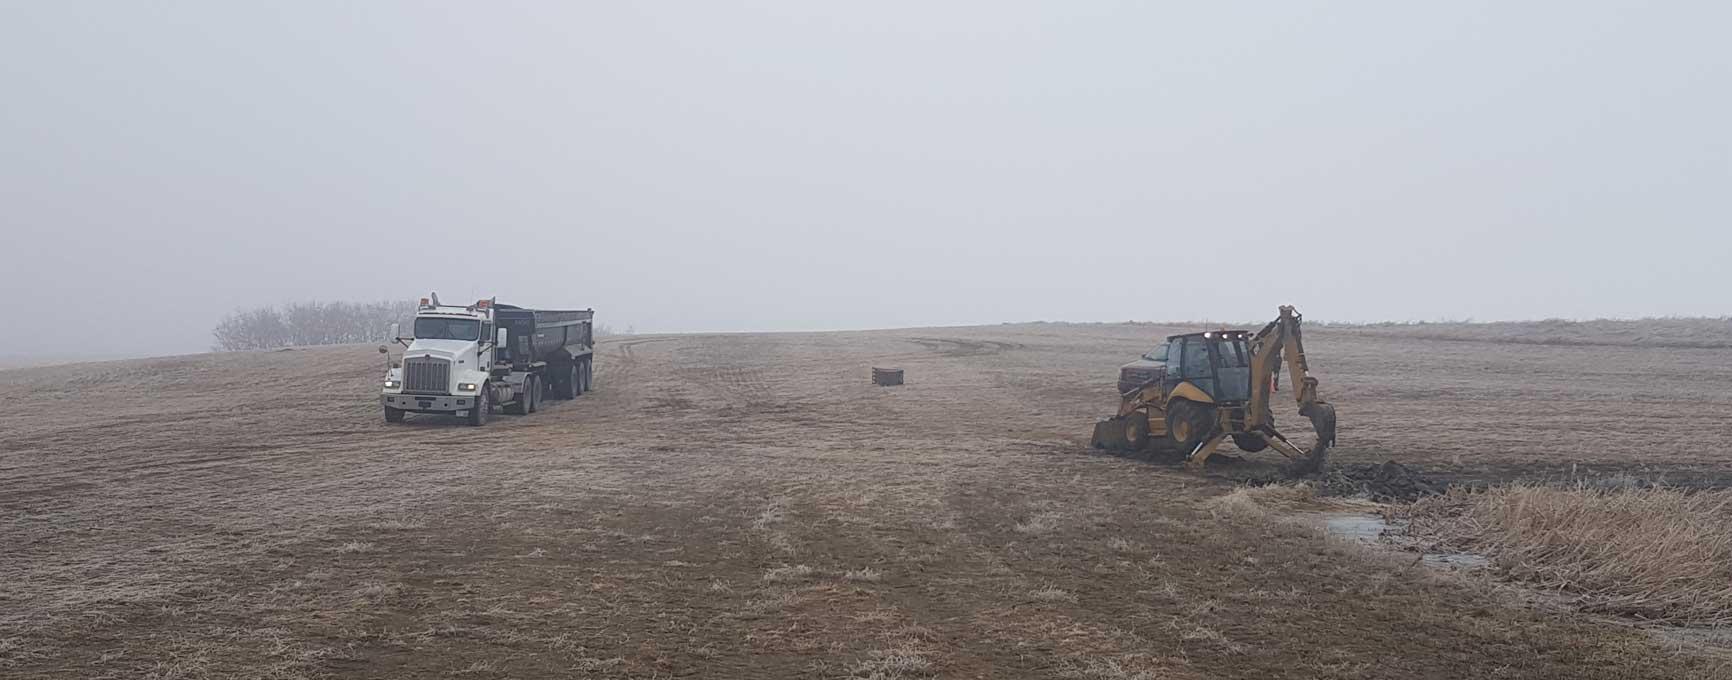 Site Remediation & Restoration Hydrosphere Technologies Environmental Consultants